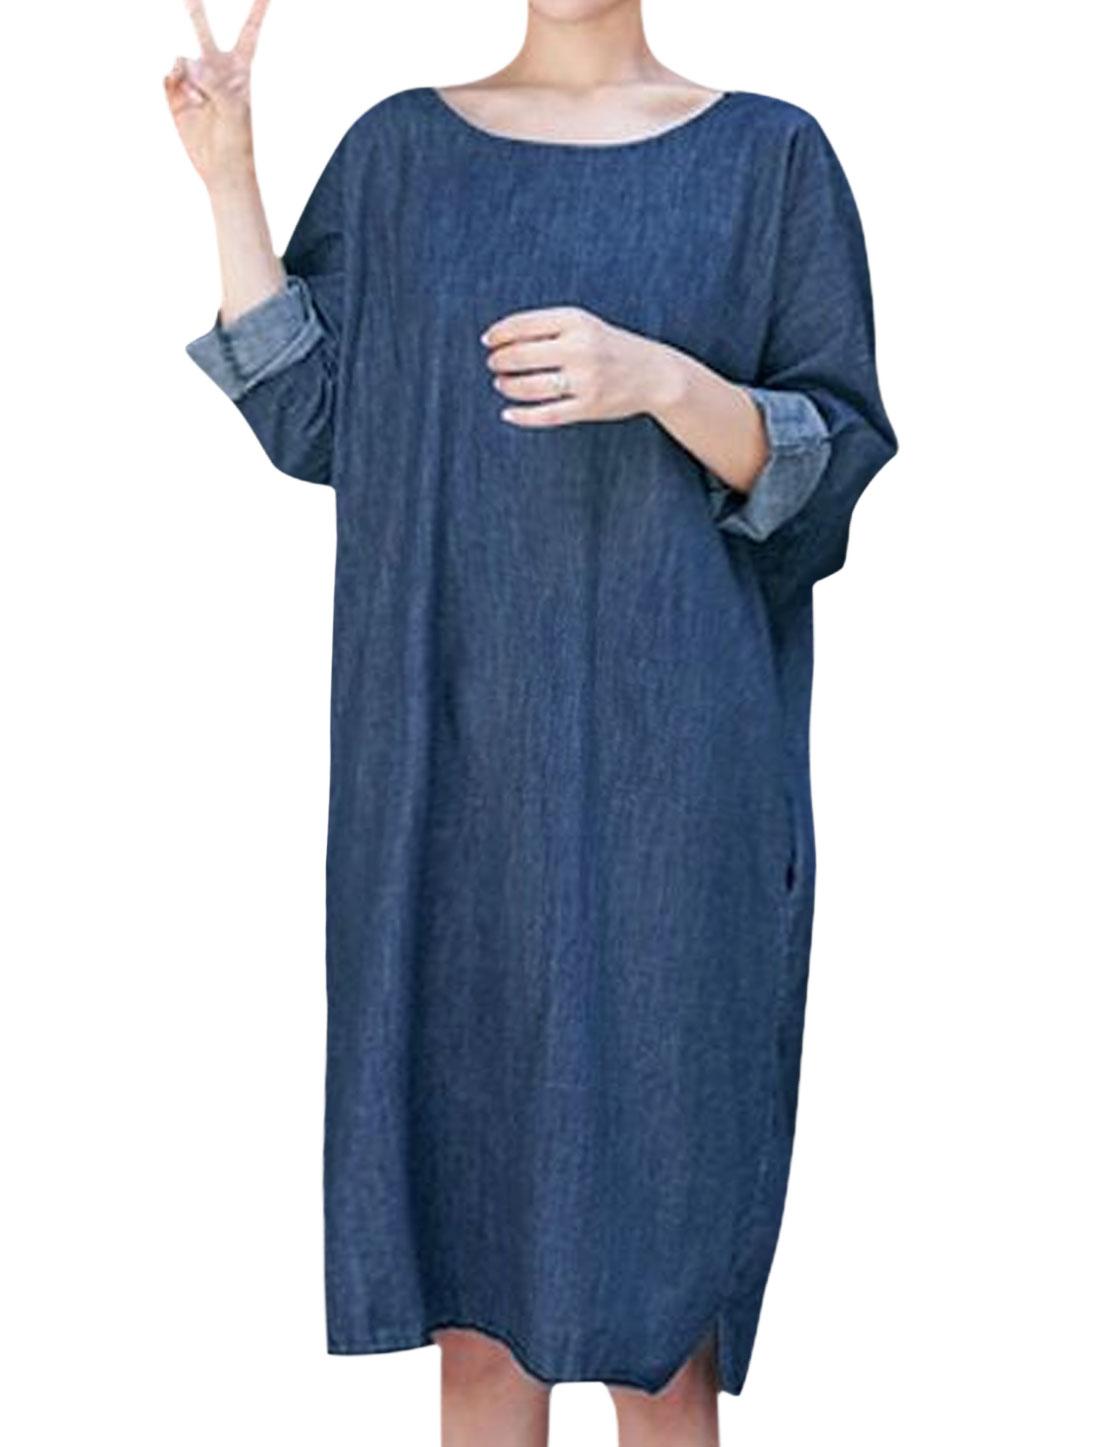 Women Batwing Sleeve Button Closure Back Loose Denim Dress Blue S